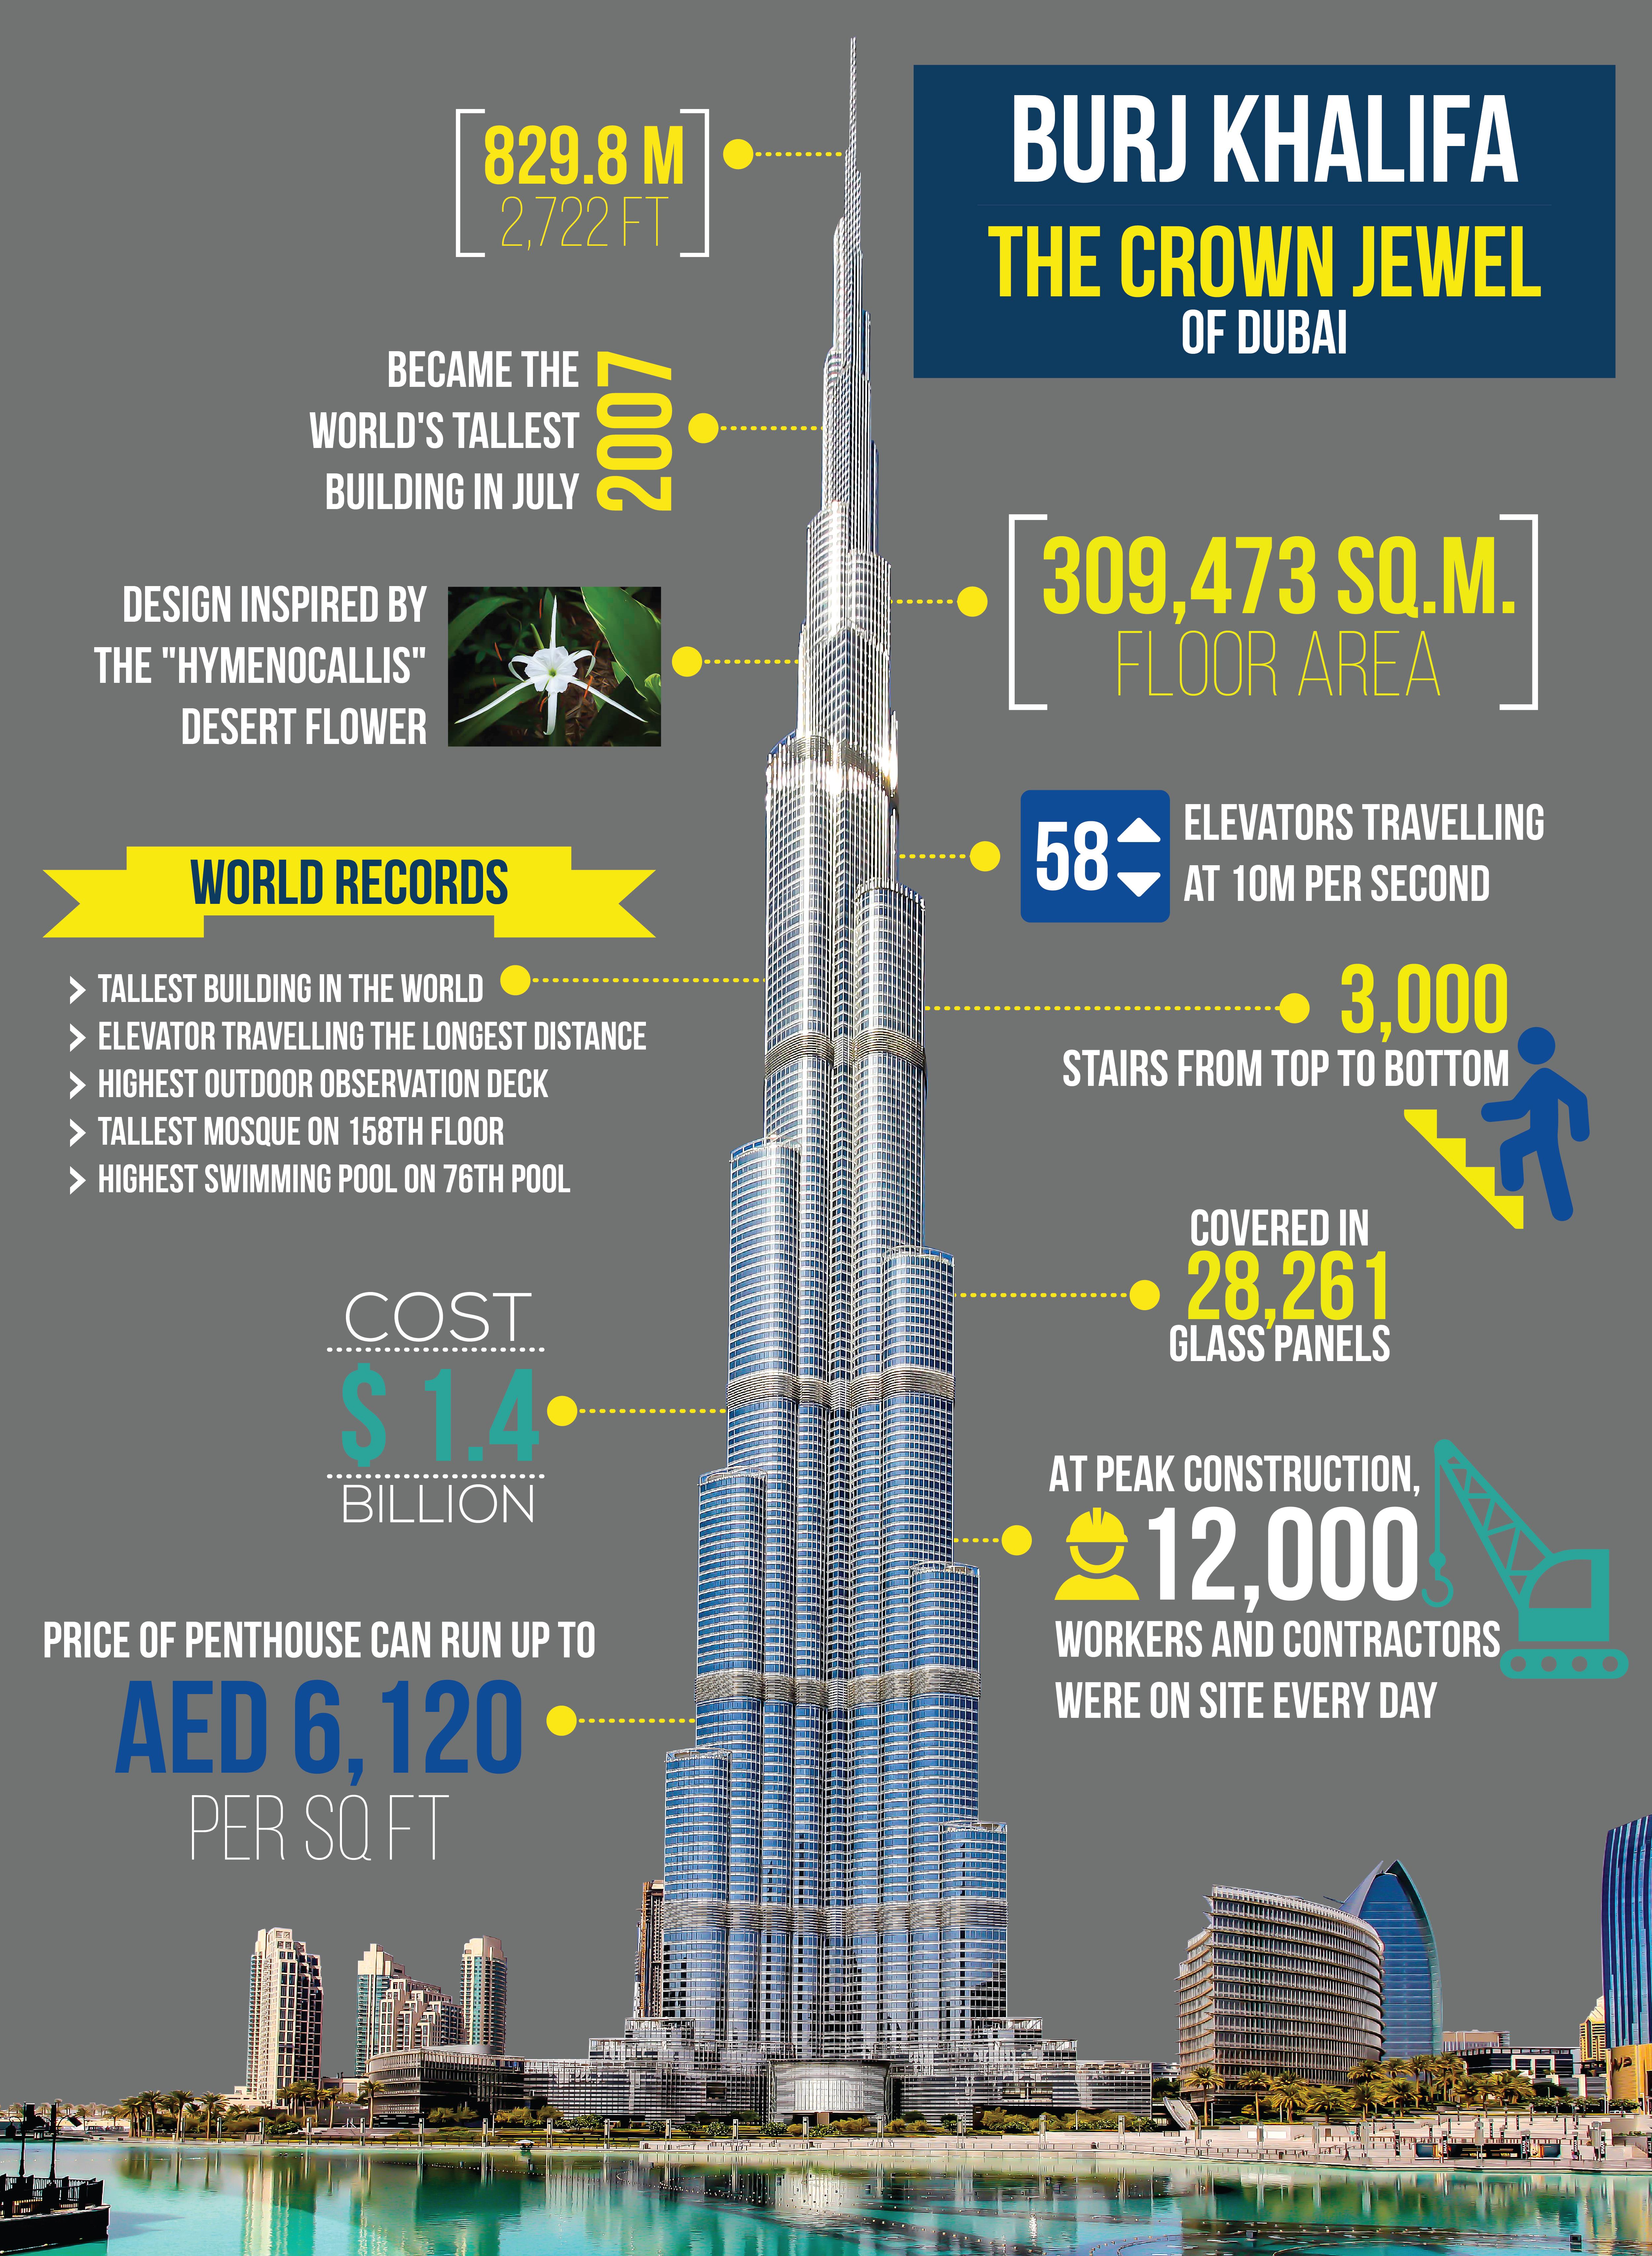 Facts and World Records of Burj Khalifa, Dubai